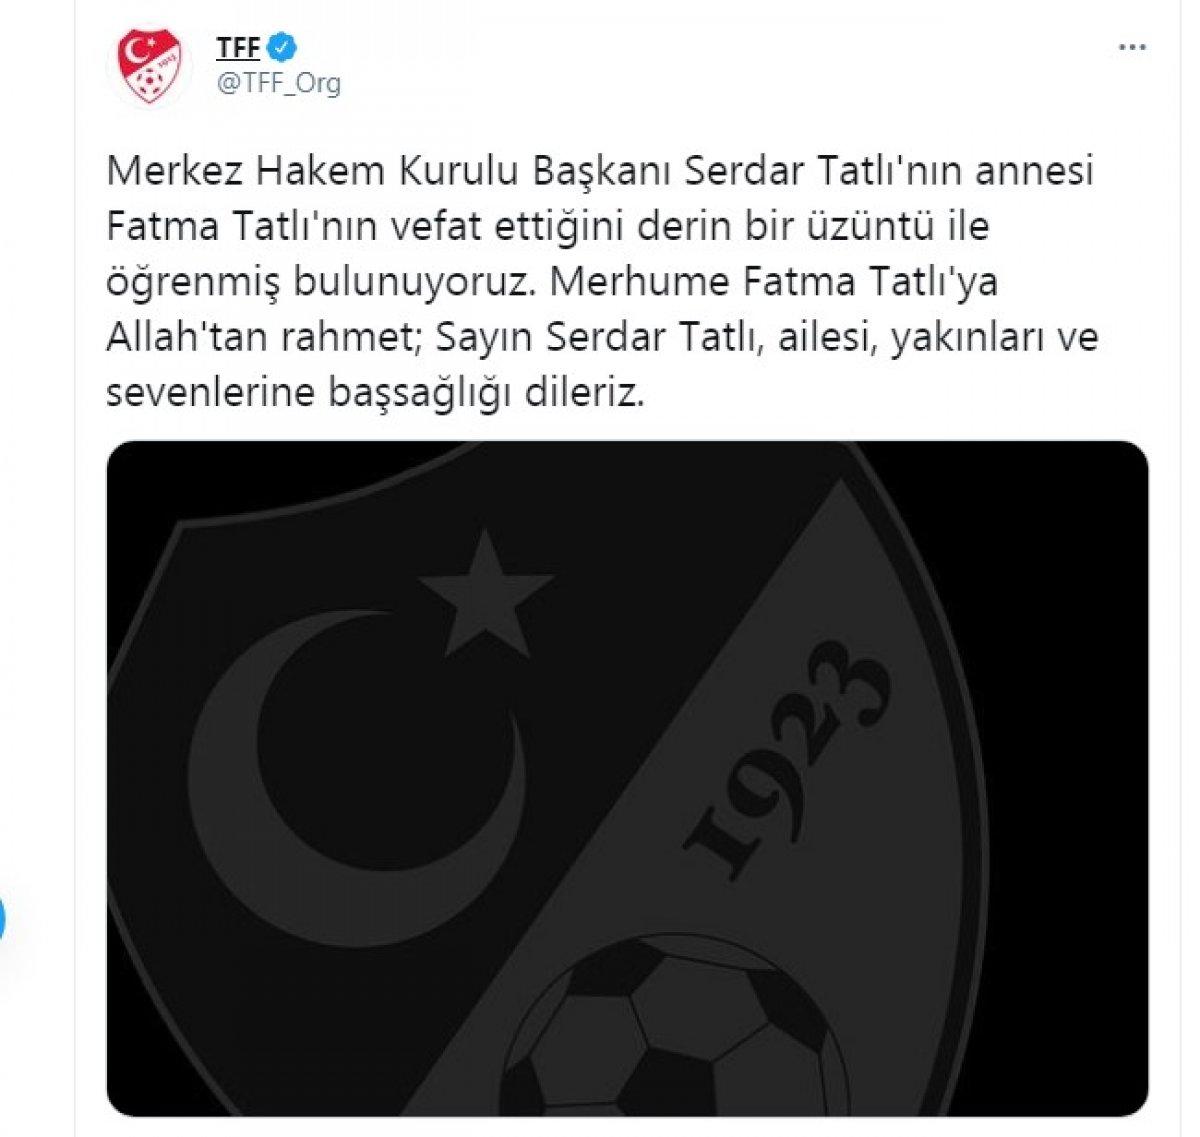 Serdar Tatlı nın annesi Fatma Tatlı vefat etti #1